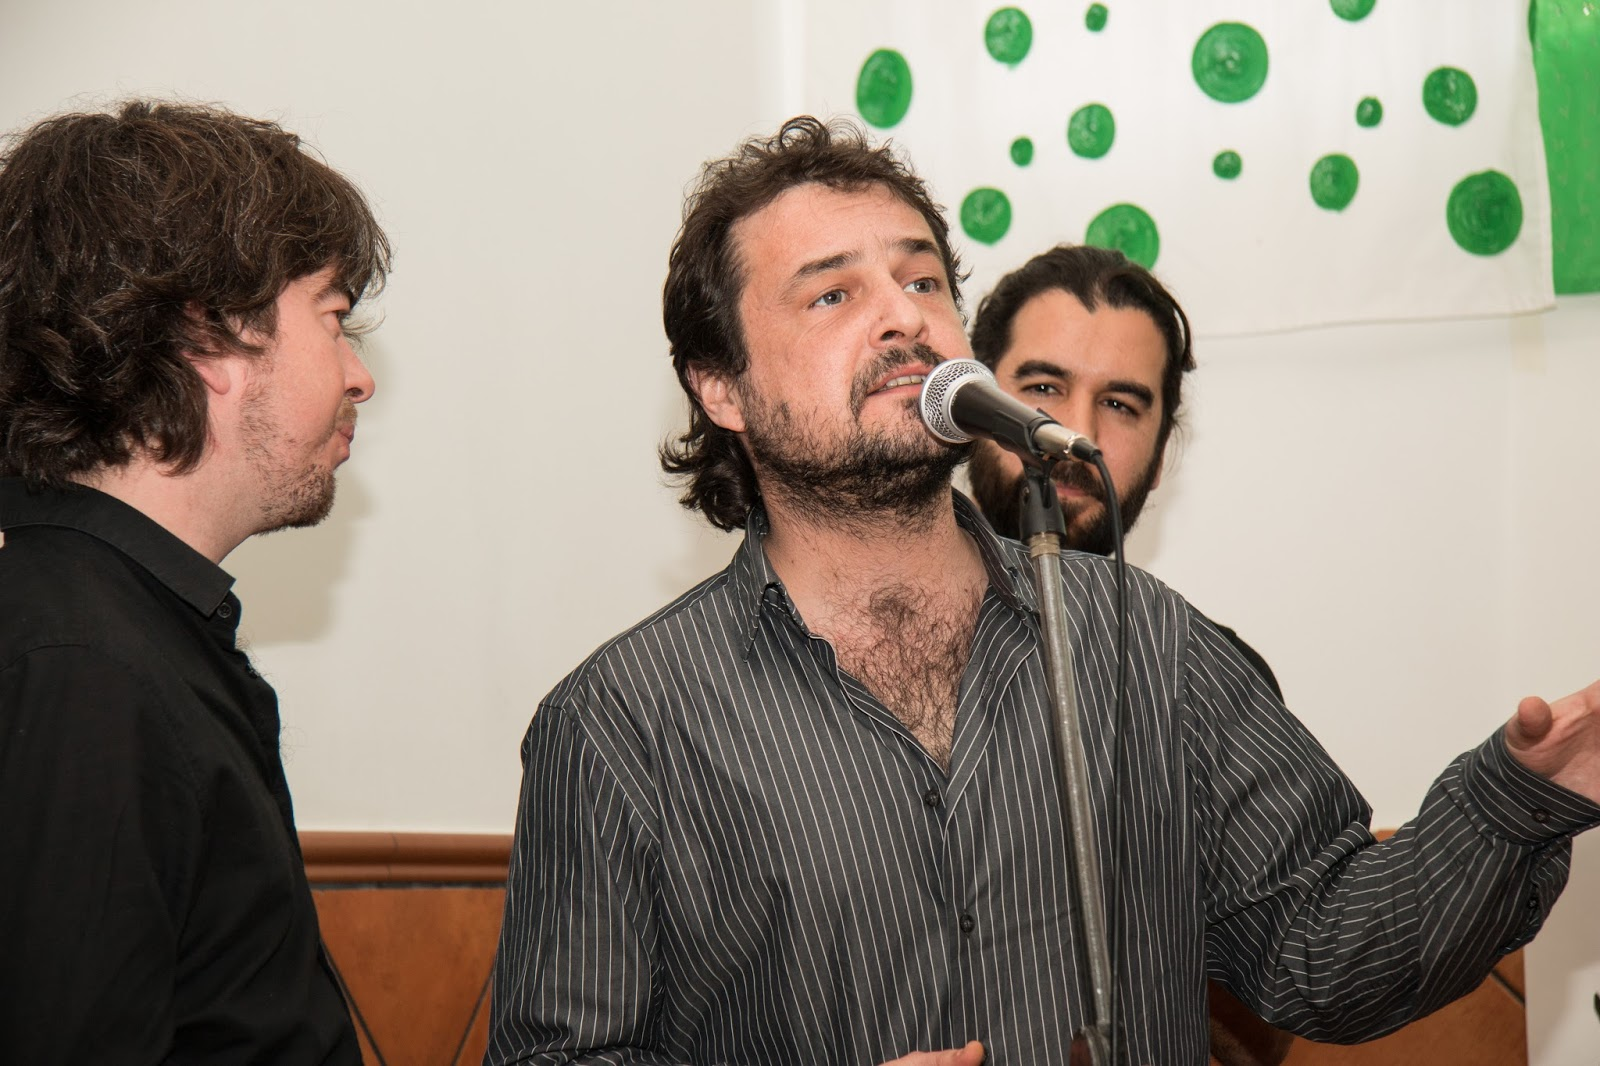 Su mal espanta fotos de palabra flamenca espect culo for Espectaculo artistico de caracter excepcional